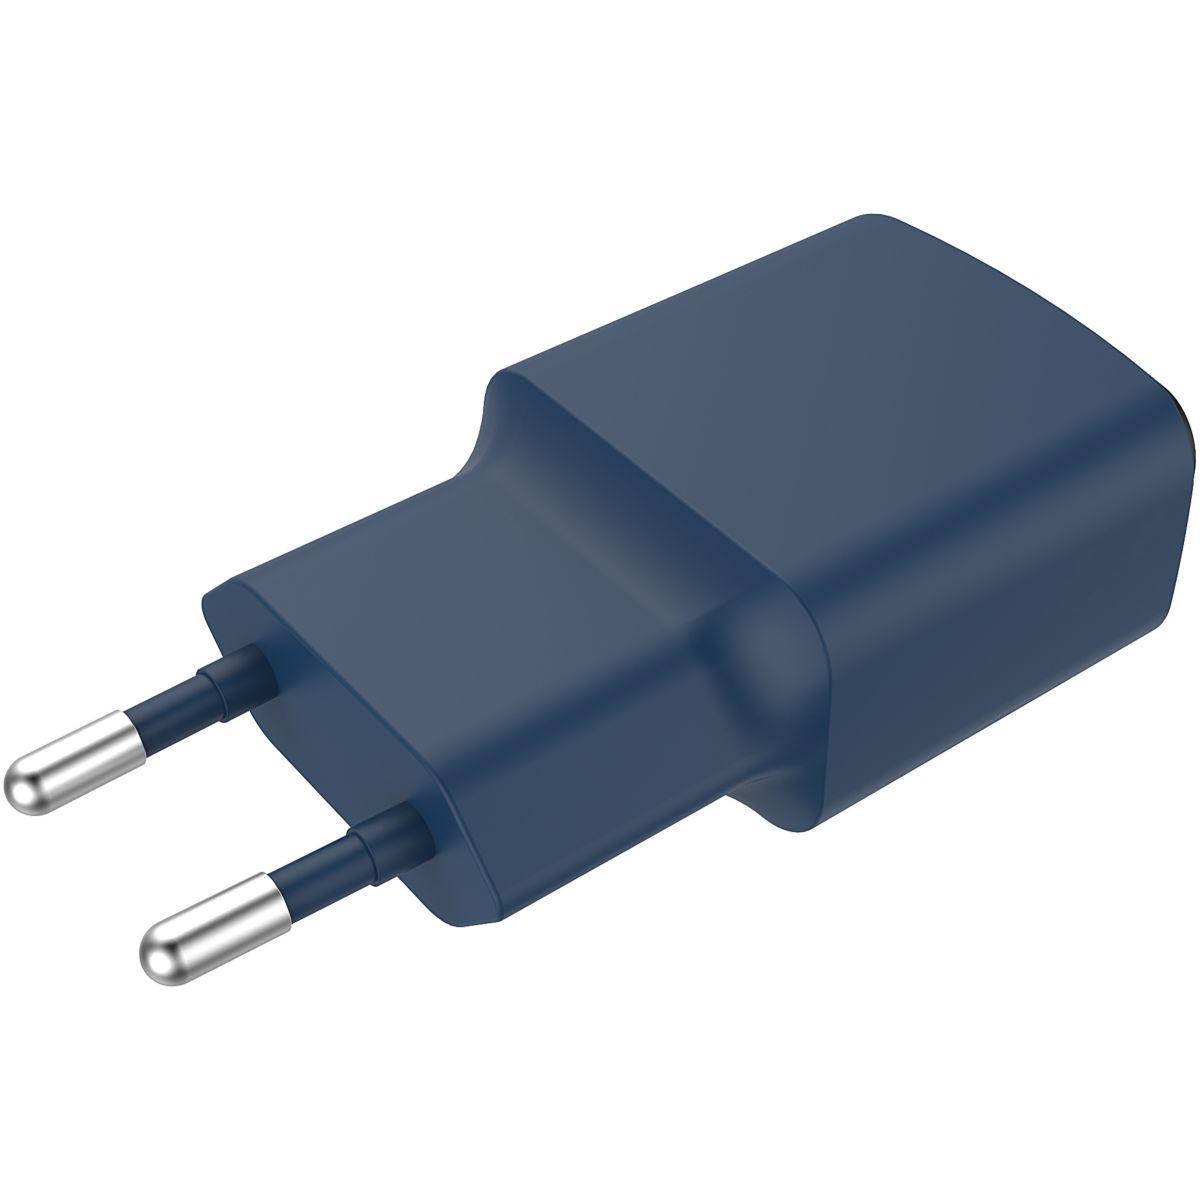 Essentielb USB 2,4A + Cable Micro USB noir Chargeur